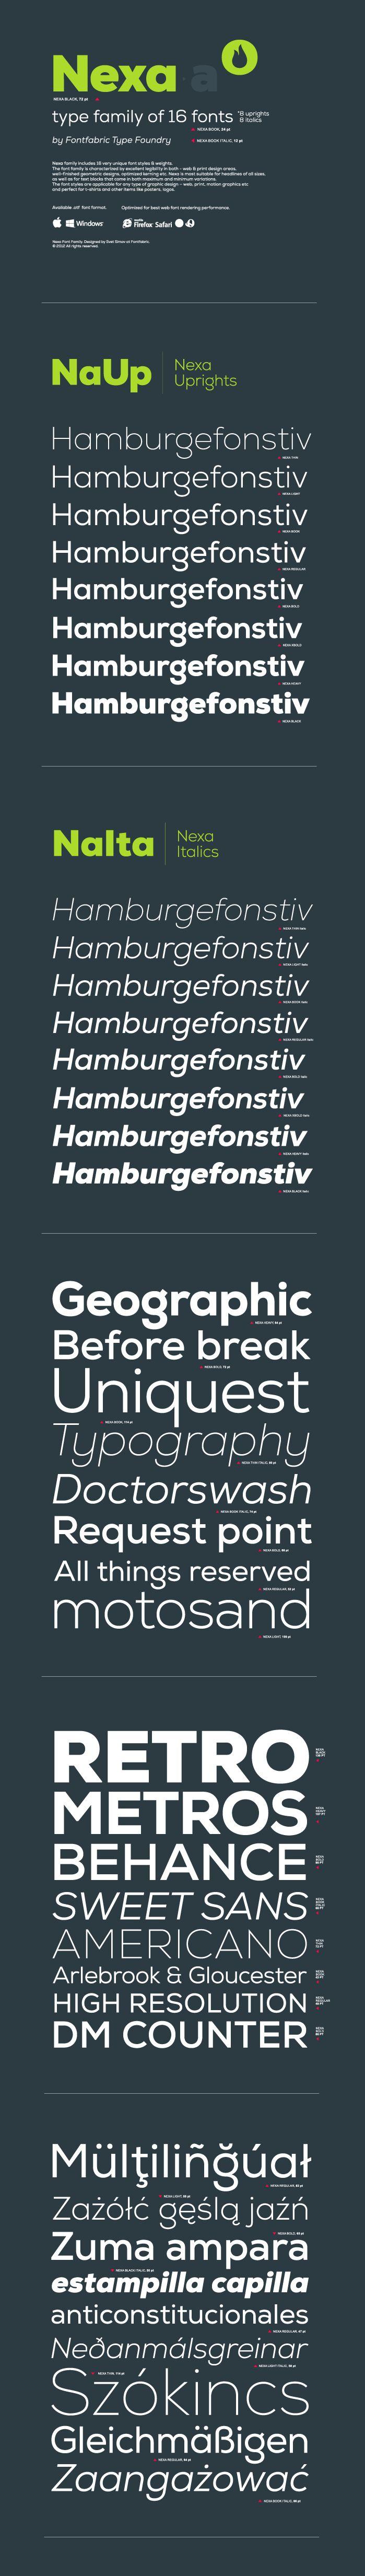 Nexa font - Fontfabric